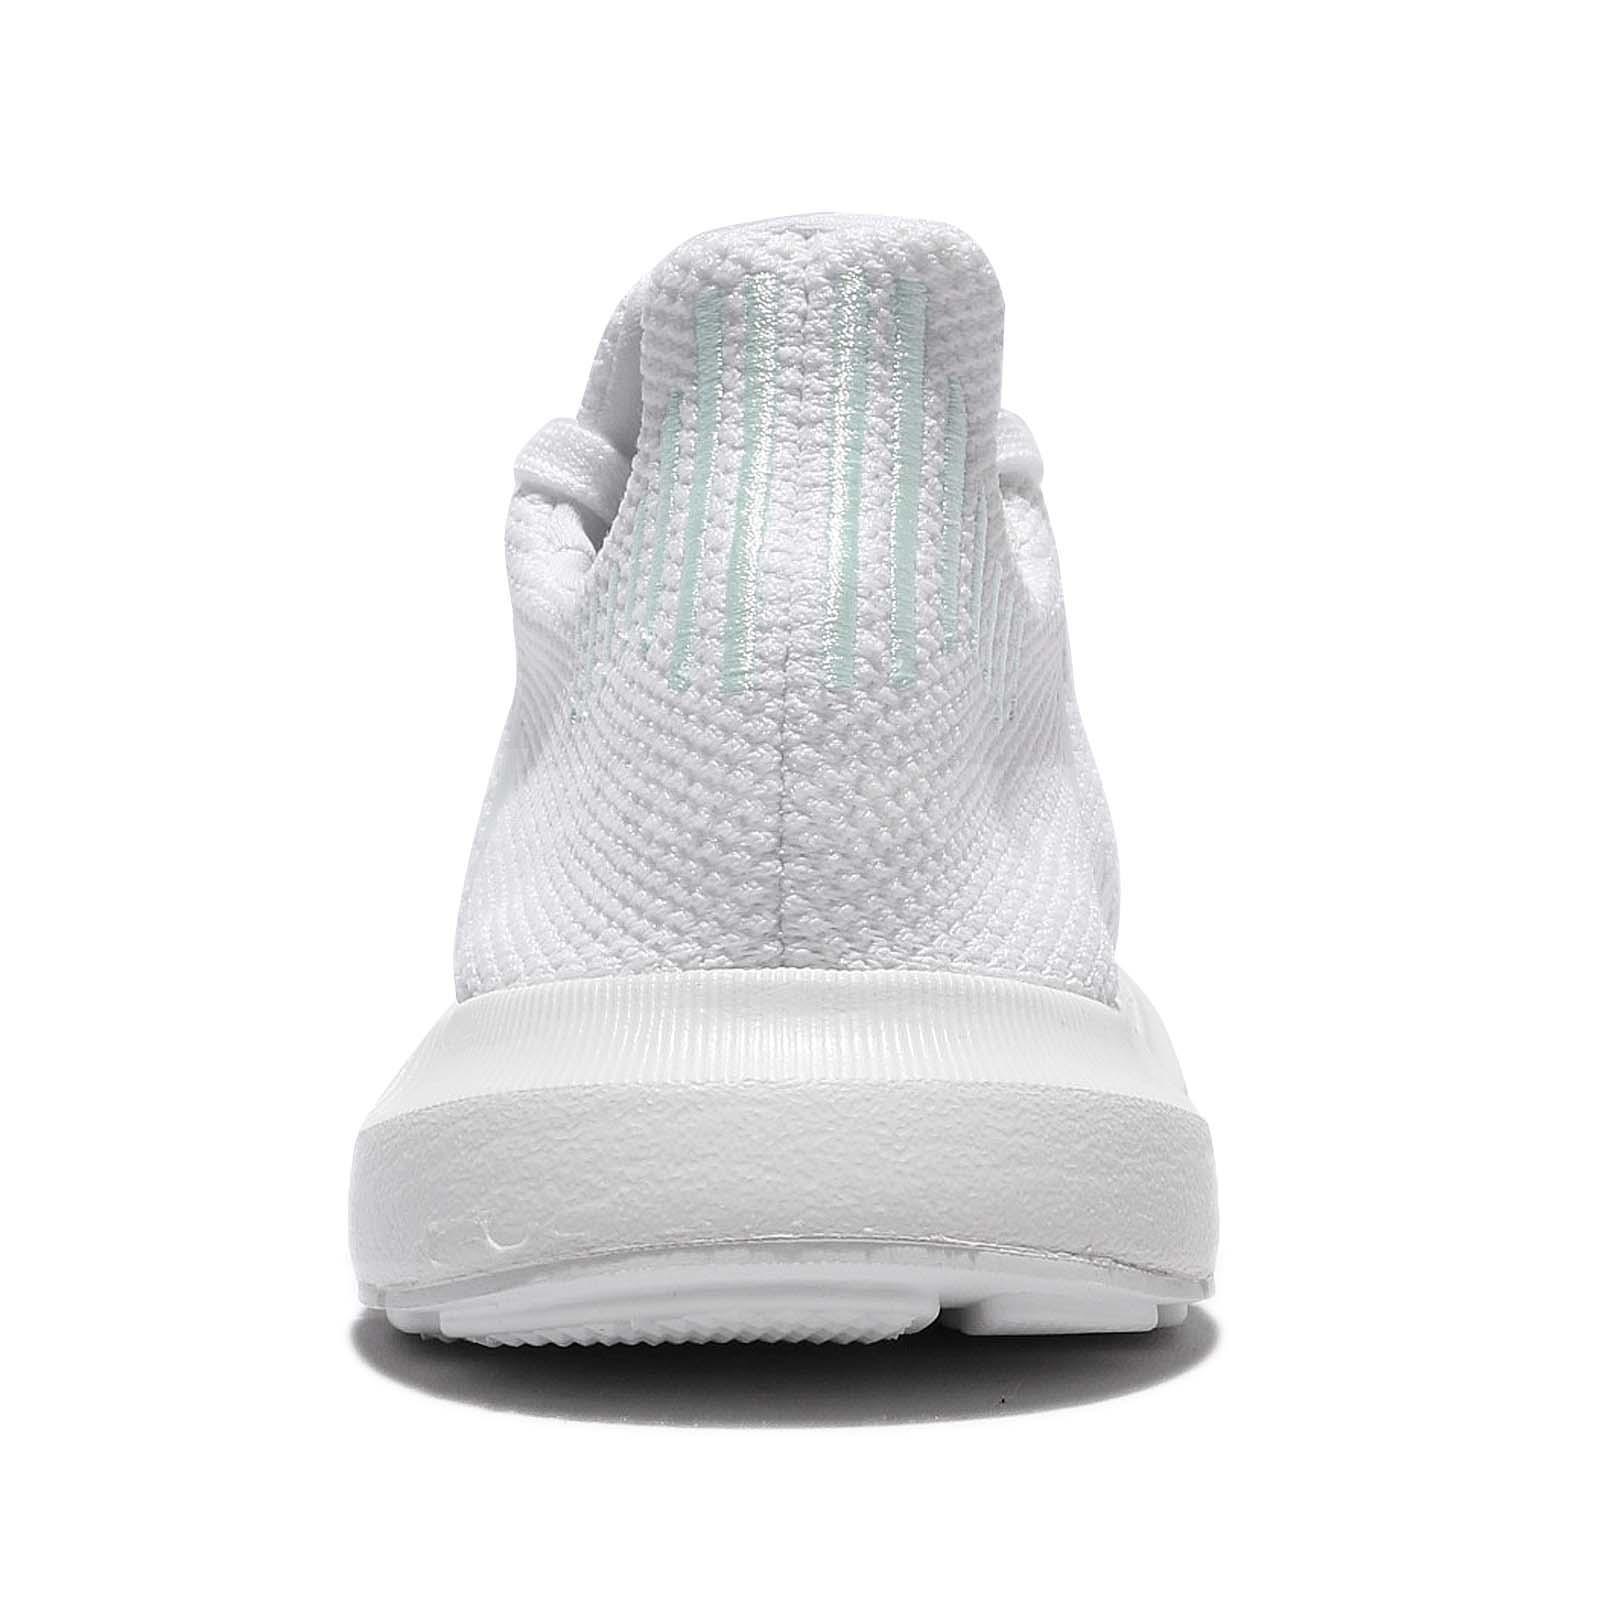 adidas originali swift run w le donne scarpe bianco verde